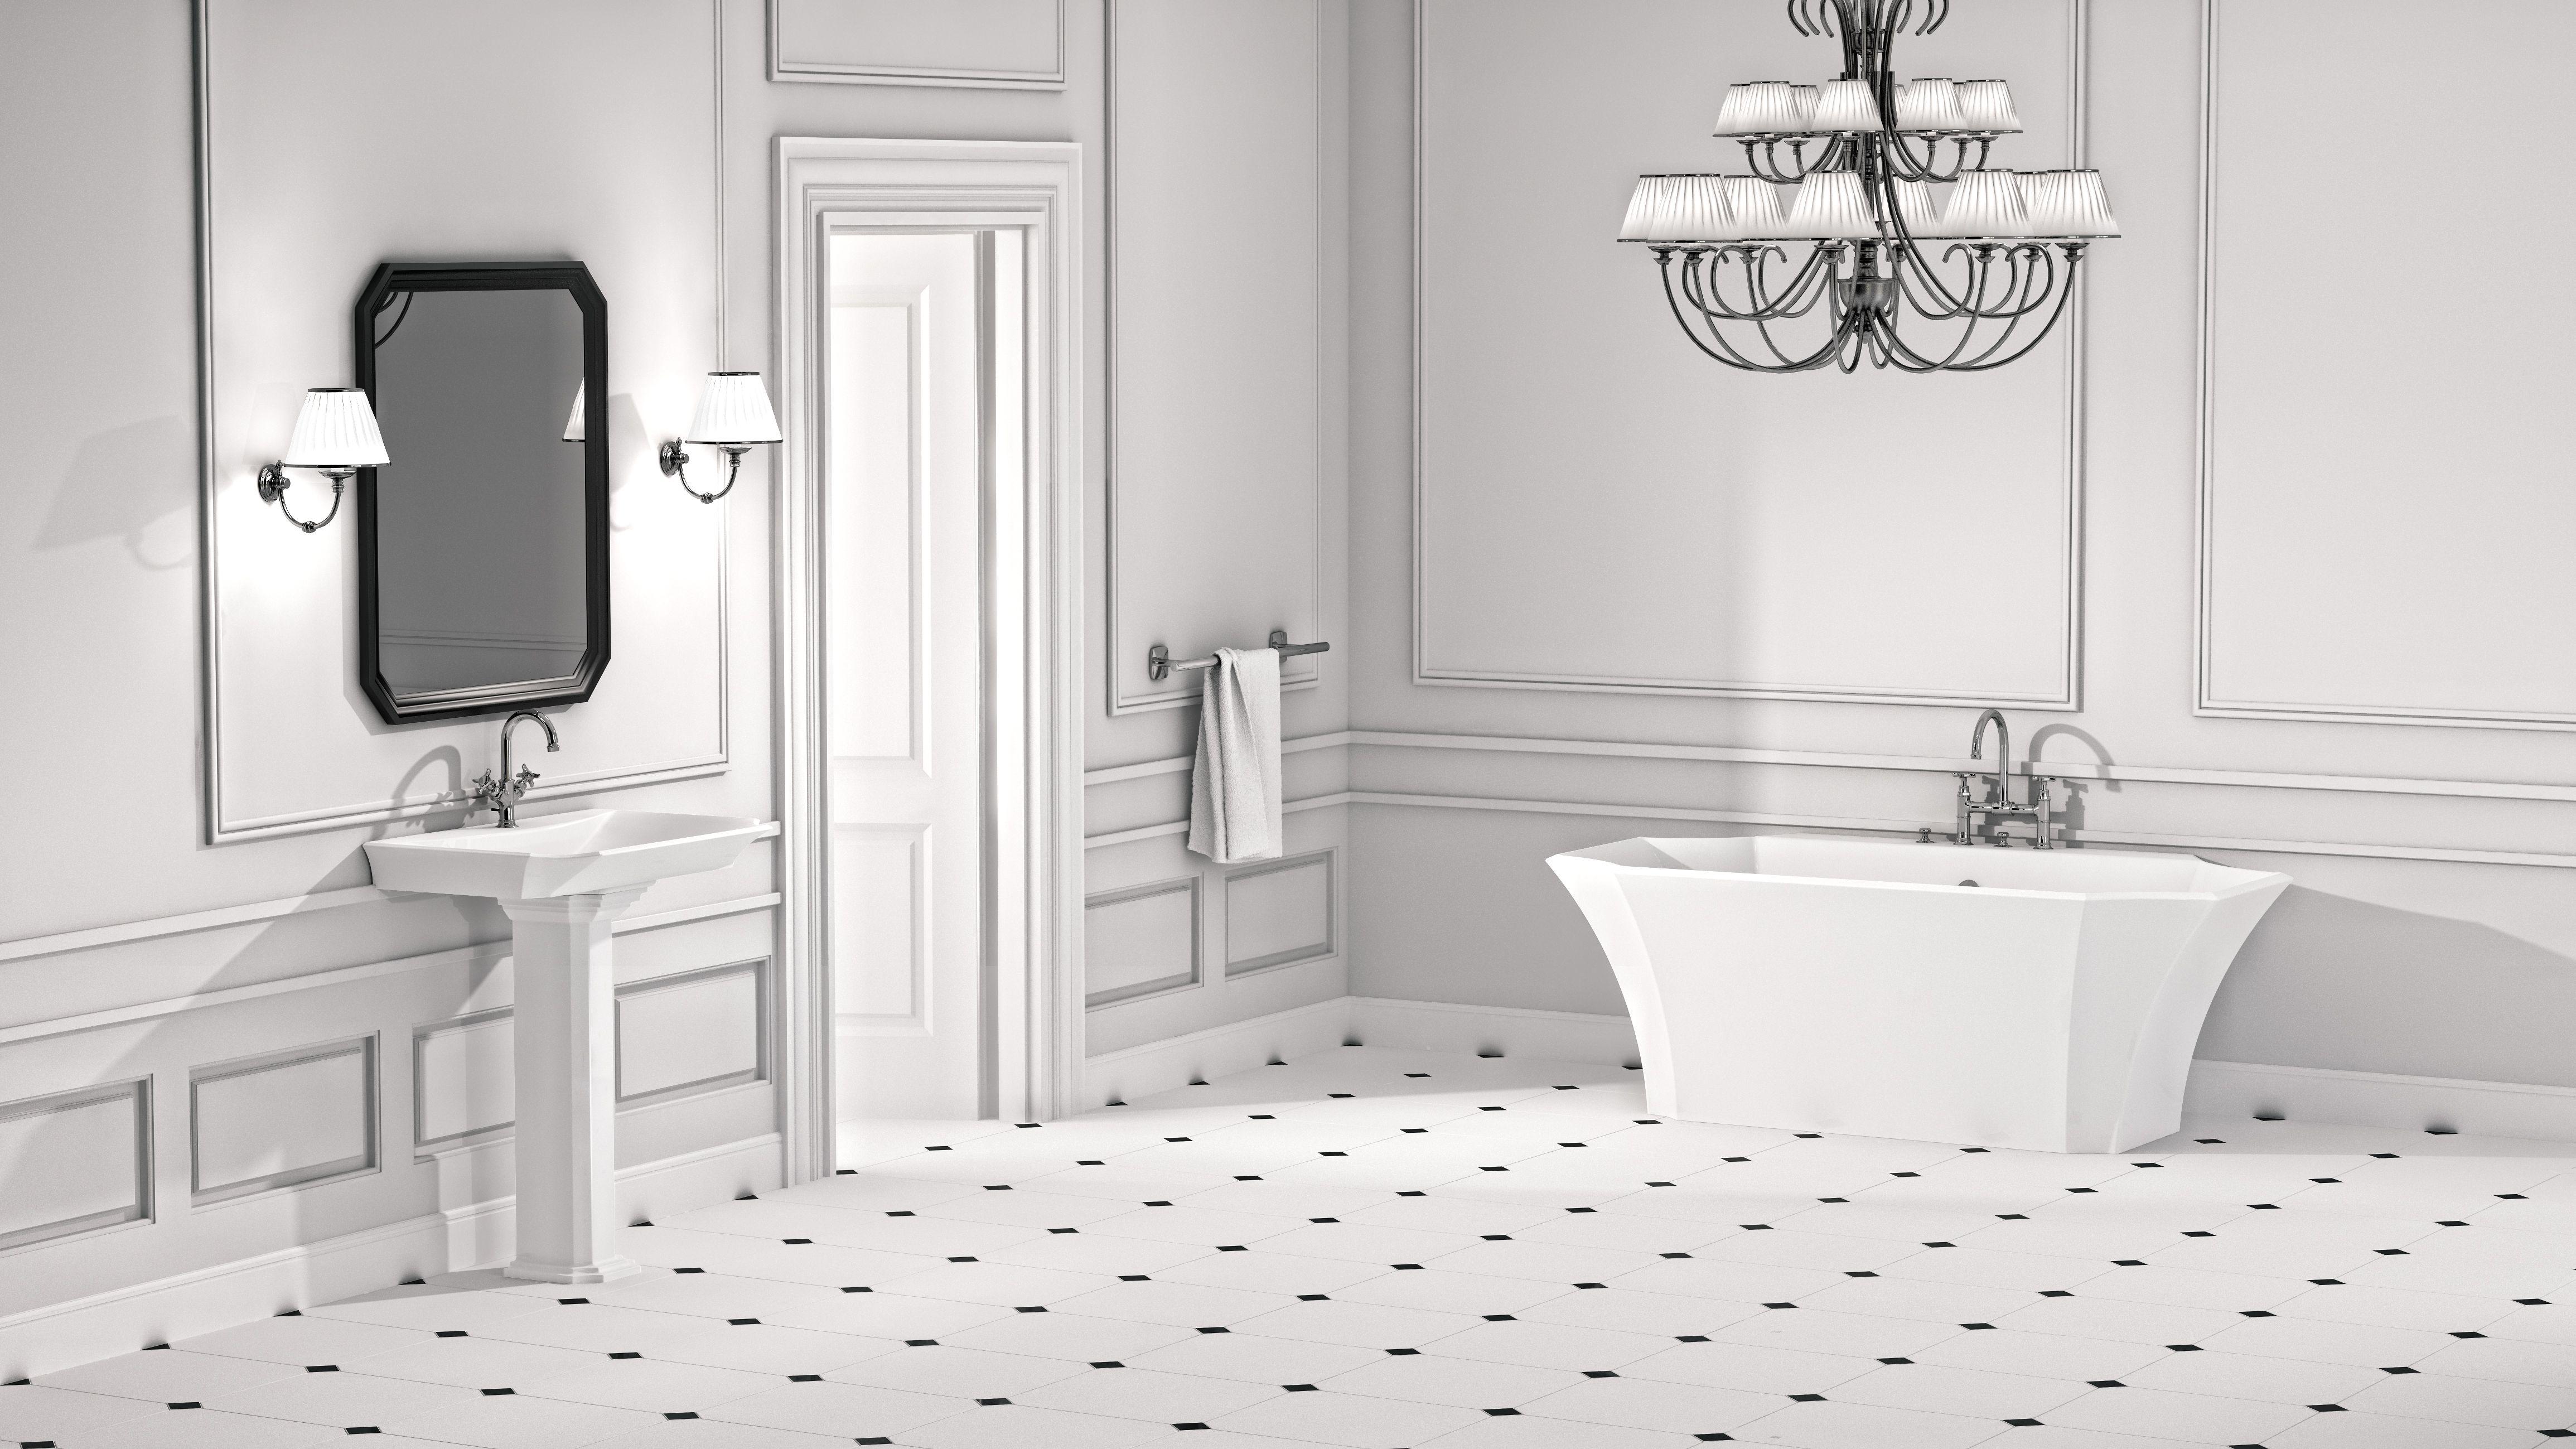 Pin On Marmorin Furdoszoba Marmorin Bathroom